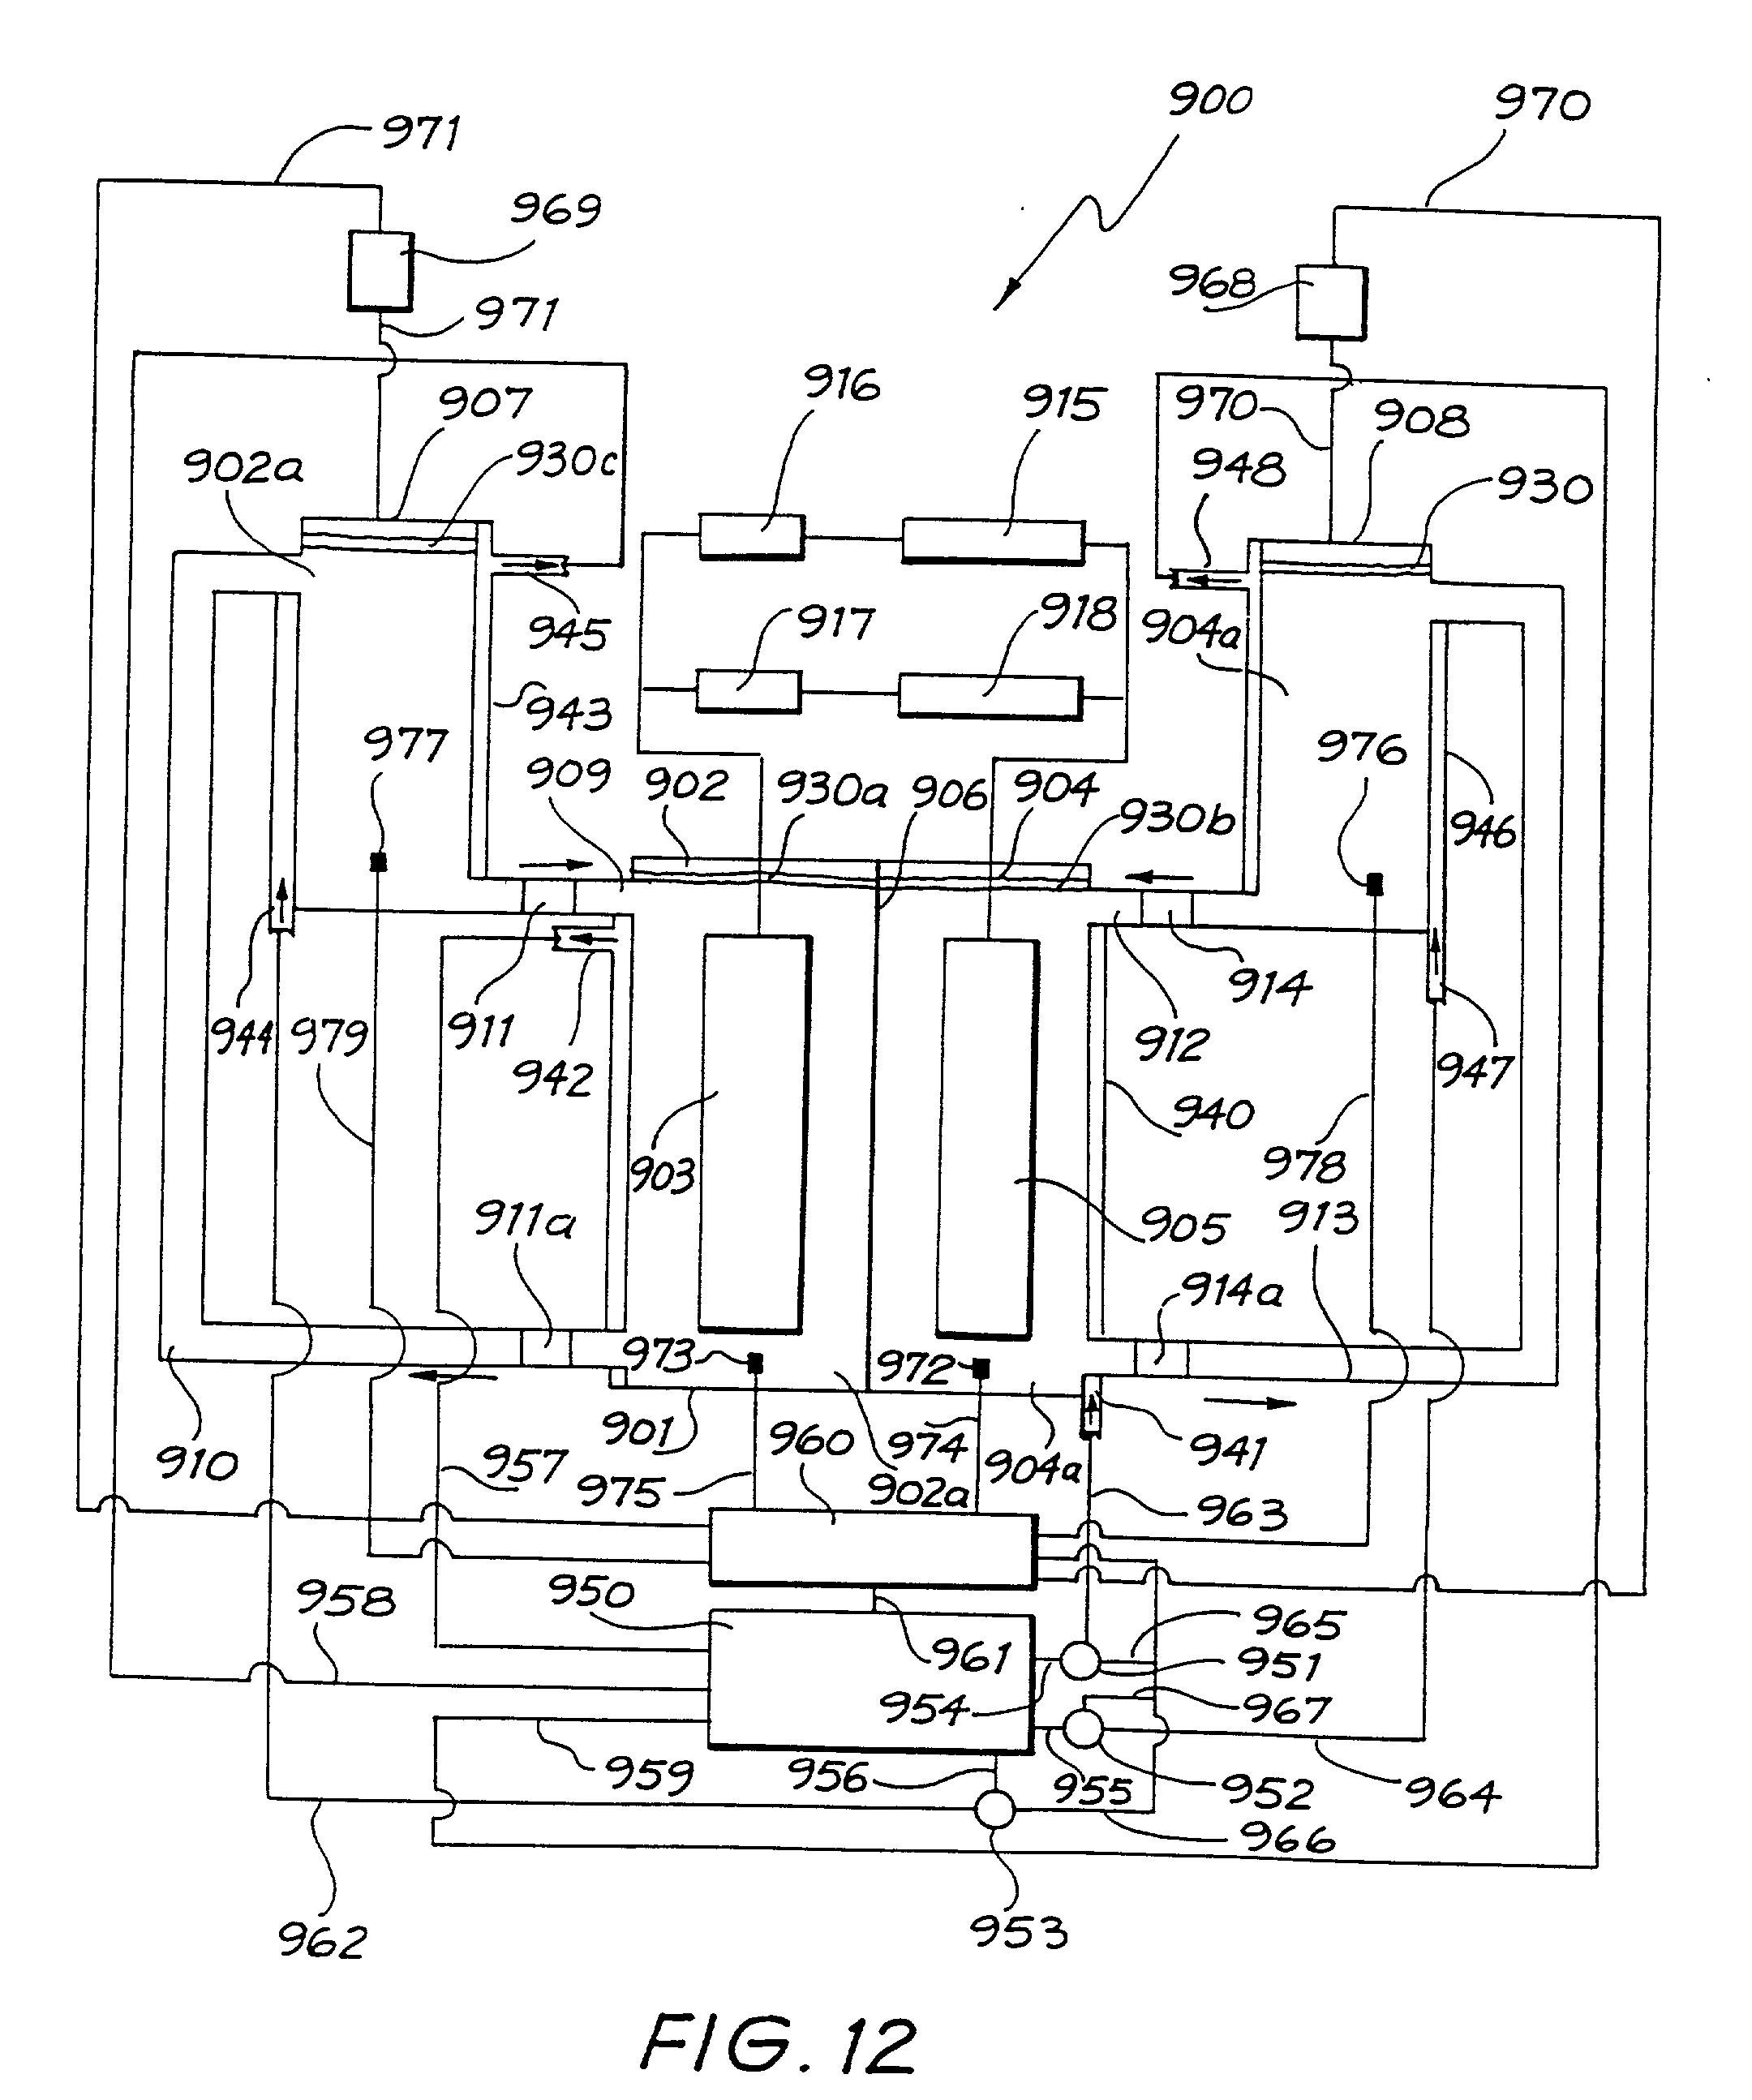 Patent Us20010028977 High Energy Density Vanadium Electrolyte 1968 Cougar Wiring Harness Drawing